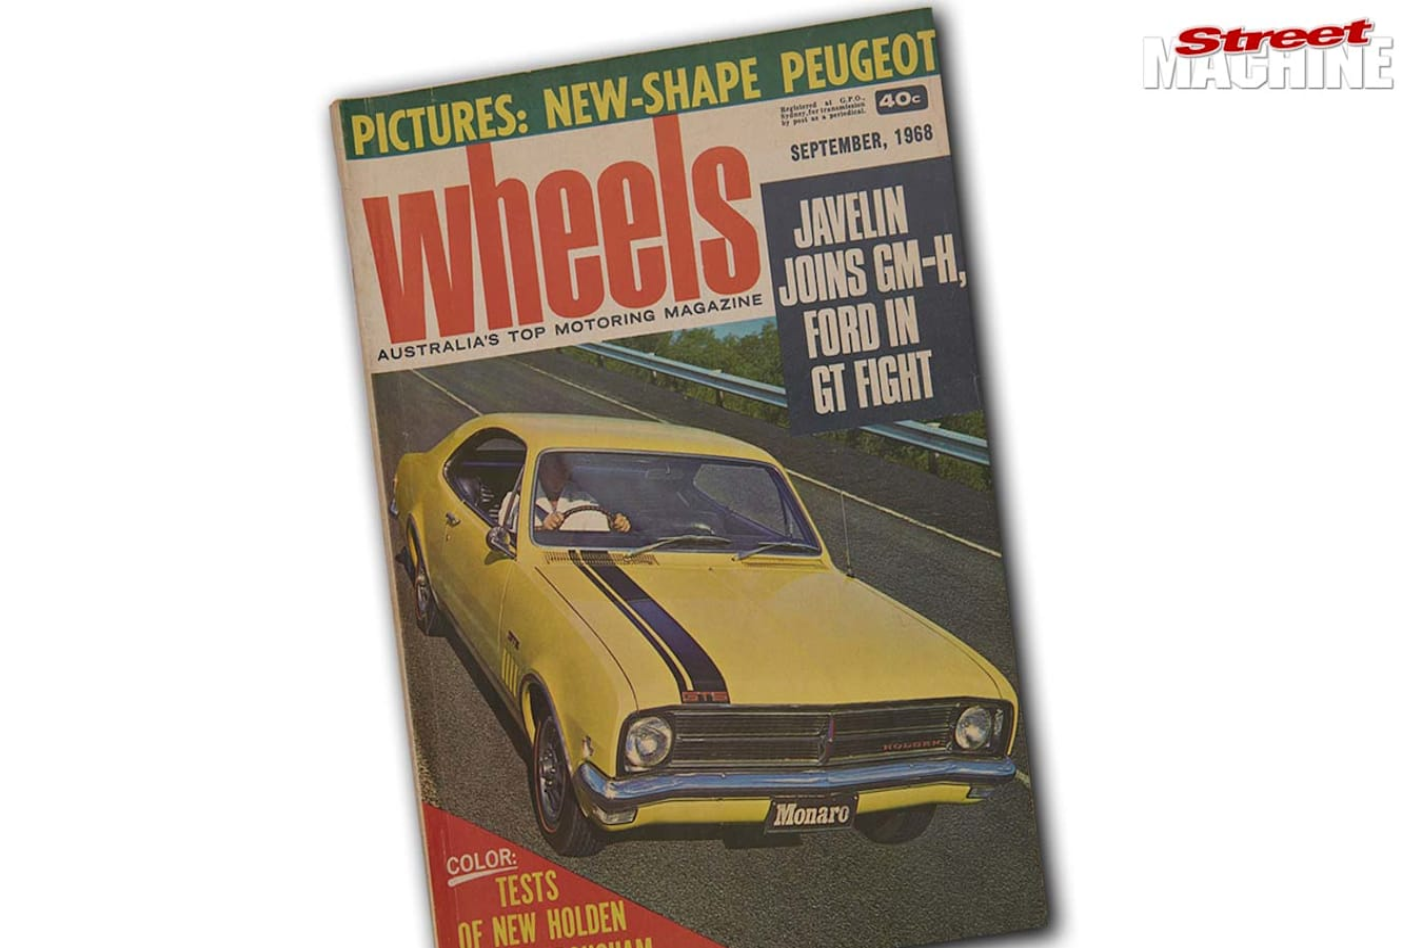 Holden Monaro Wheels Car of The Year